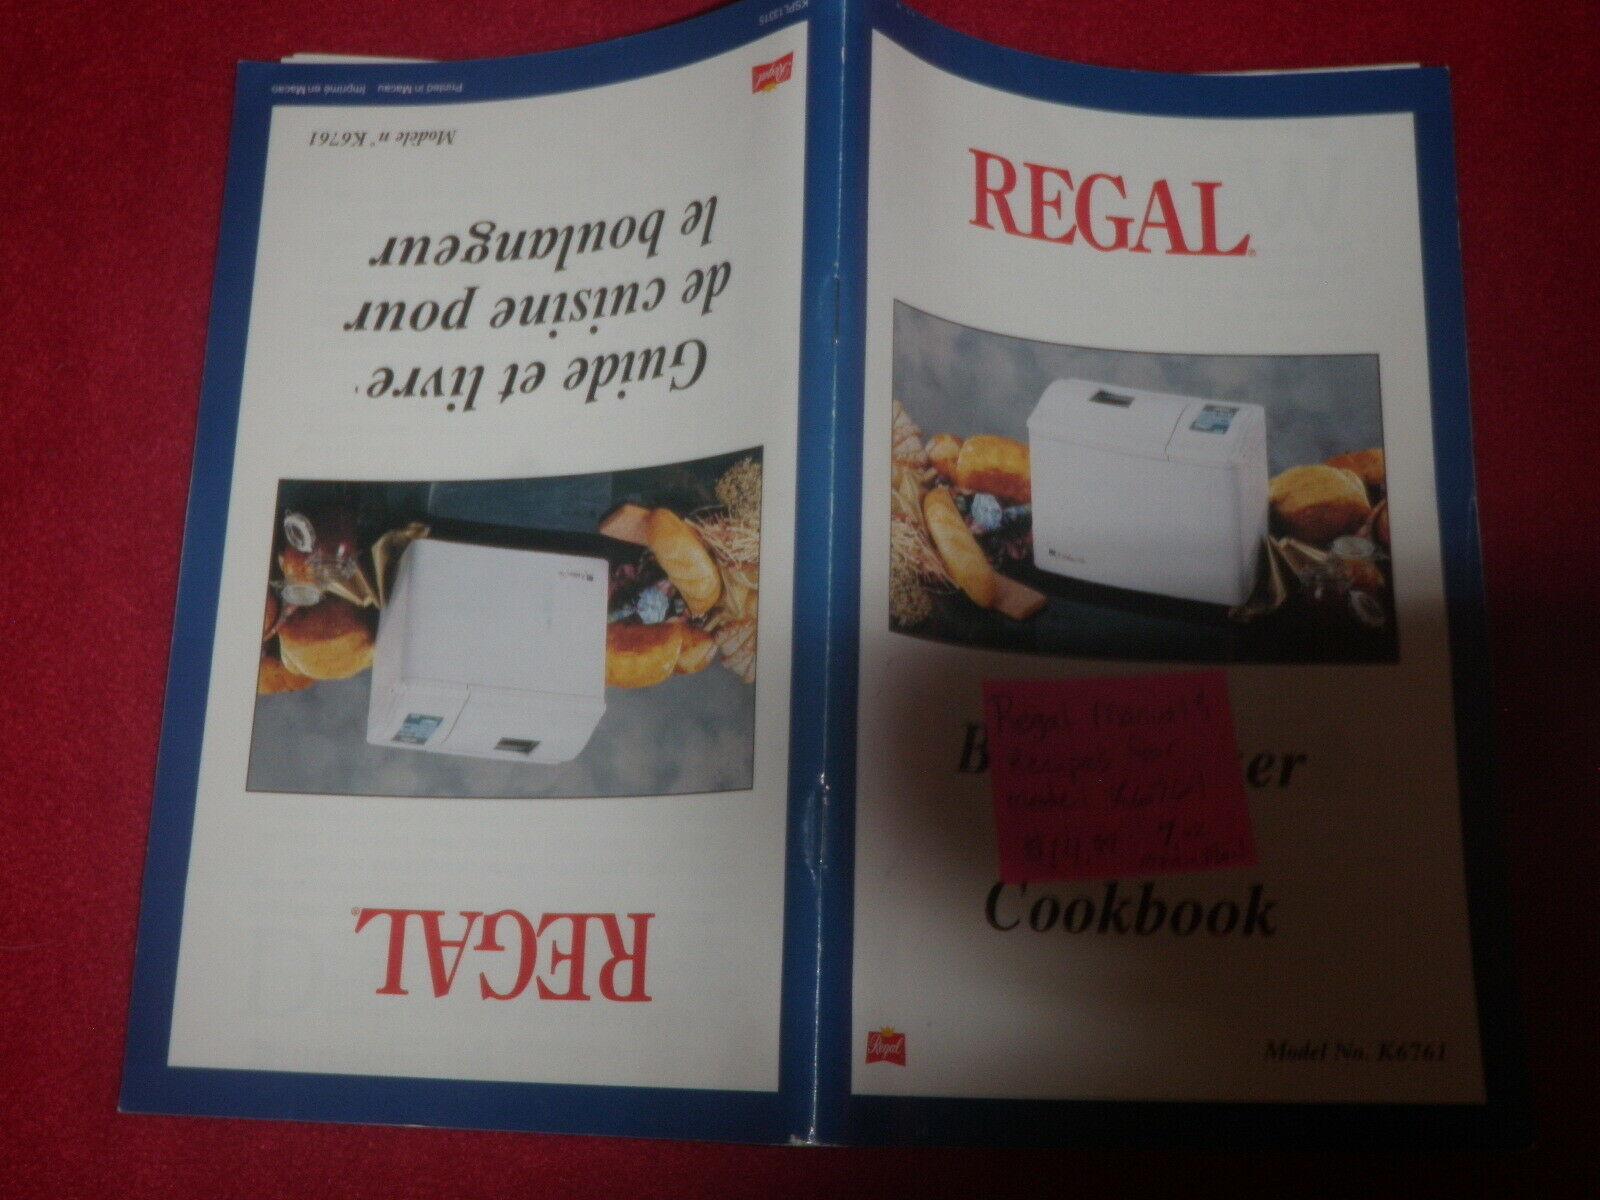 Regal Bread Maker Machine Manuel and Recipes for Model K6761  image 4